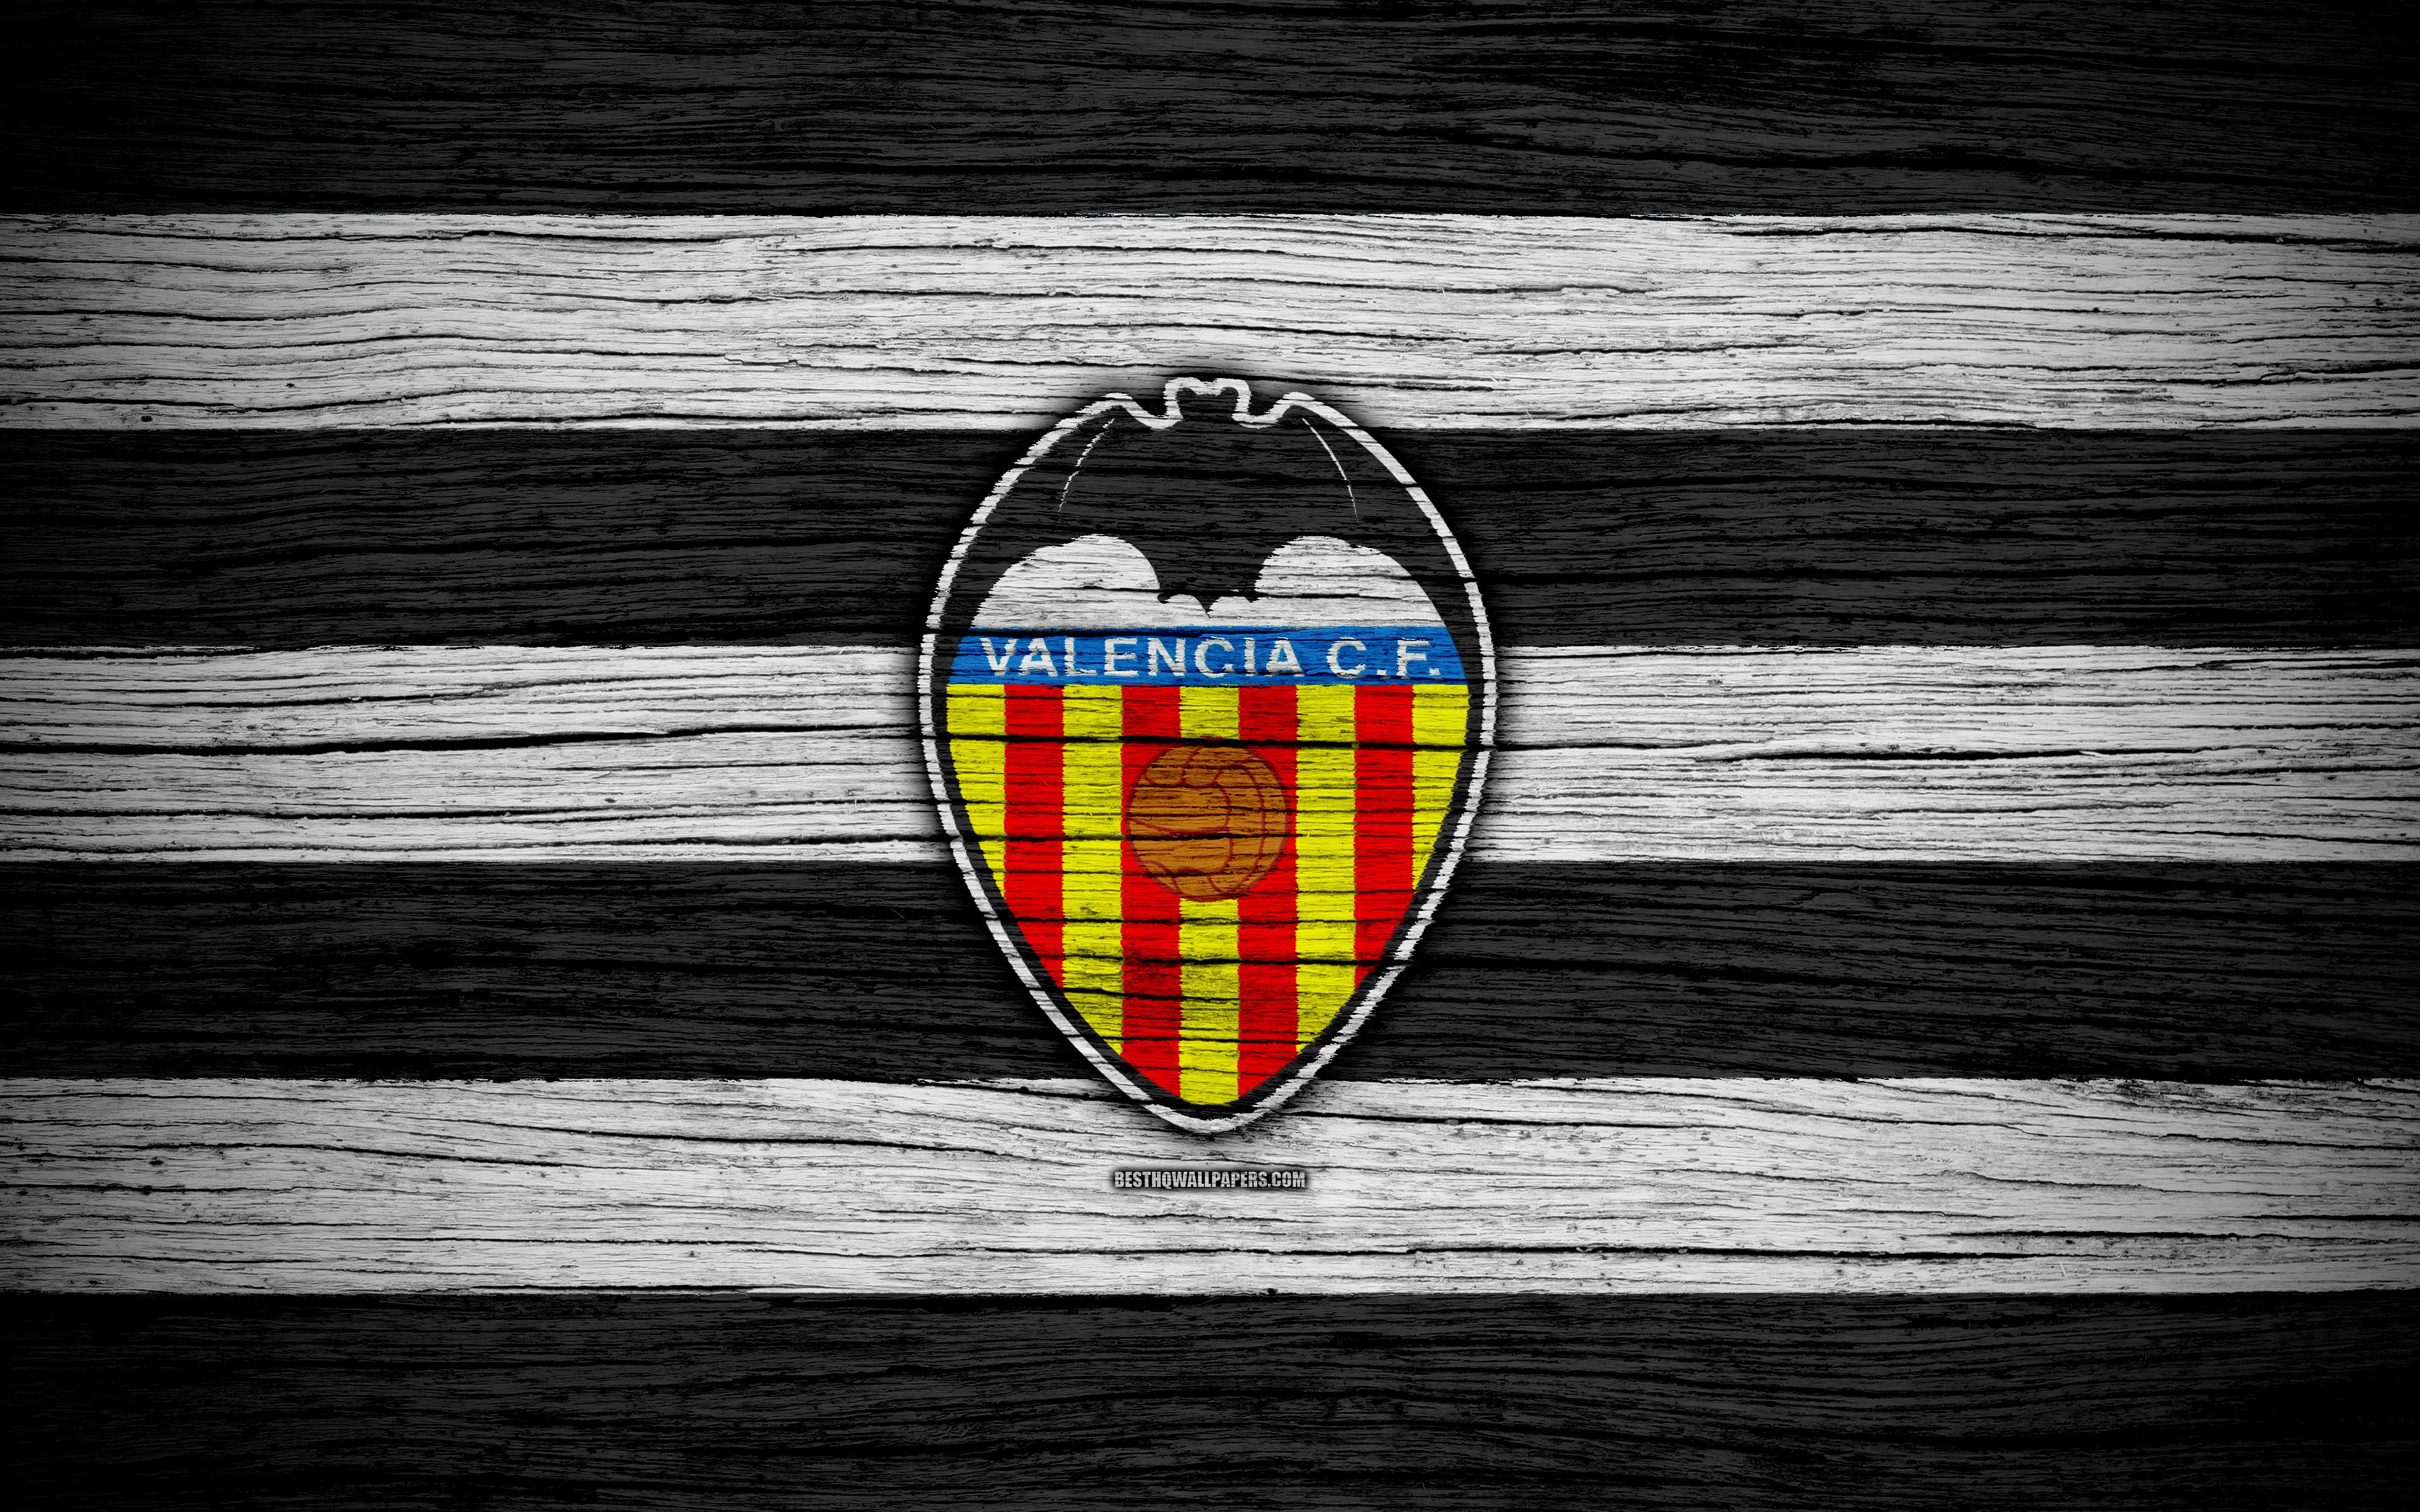 Valencia Cf 4k Ultra Hd Wallpaper - Leicester City , HD Wallpaper & Backgrounds